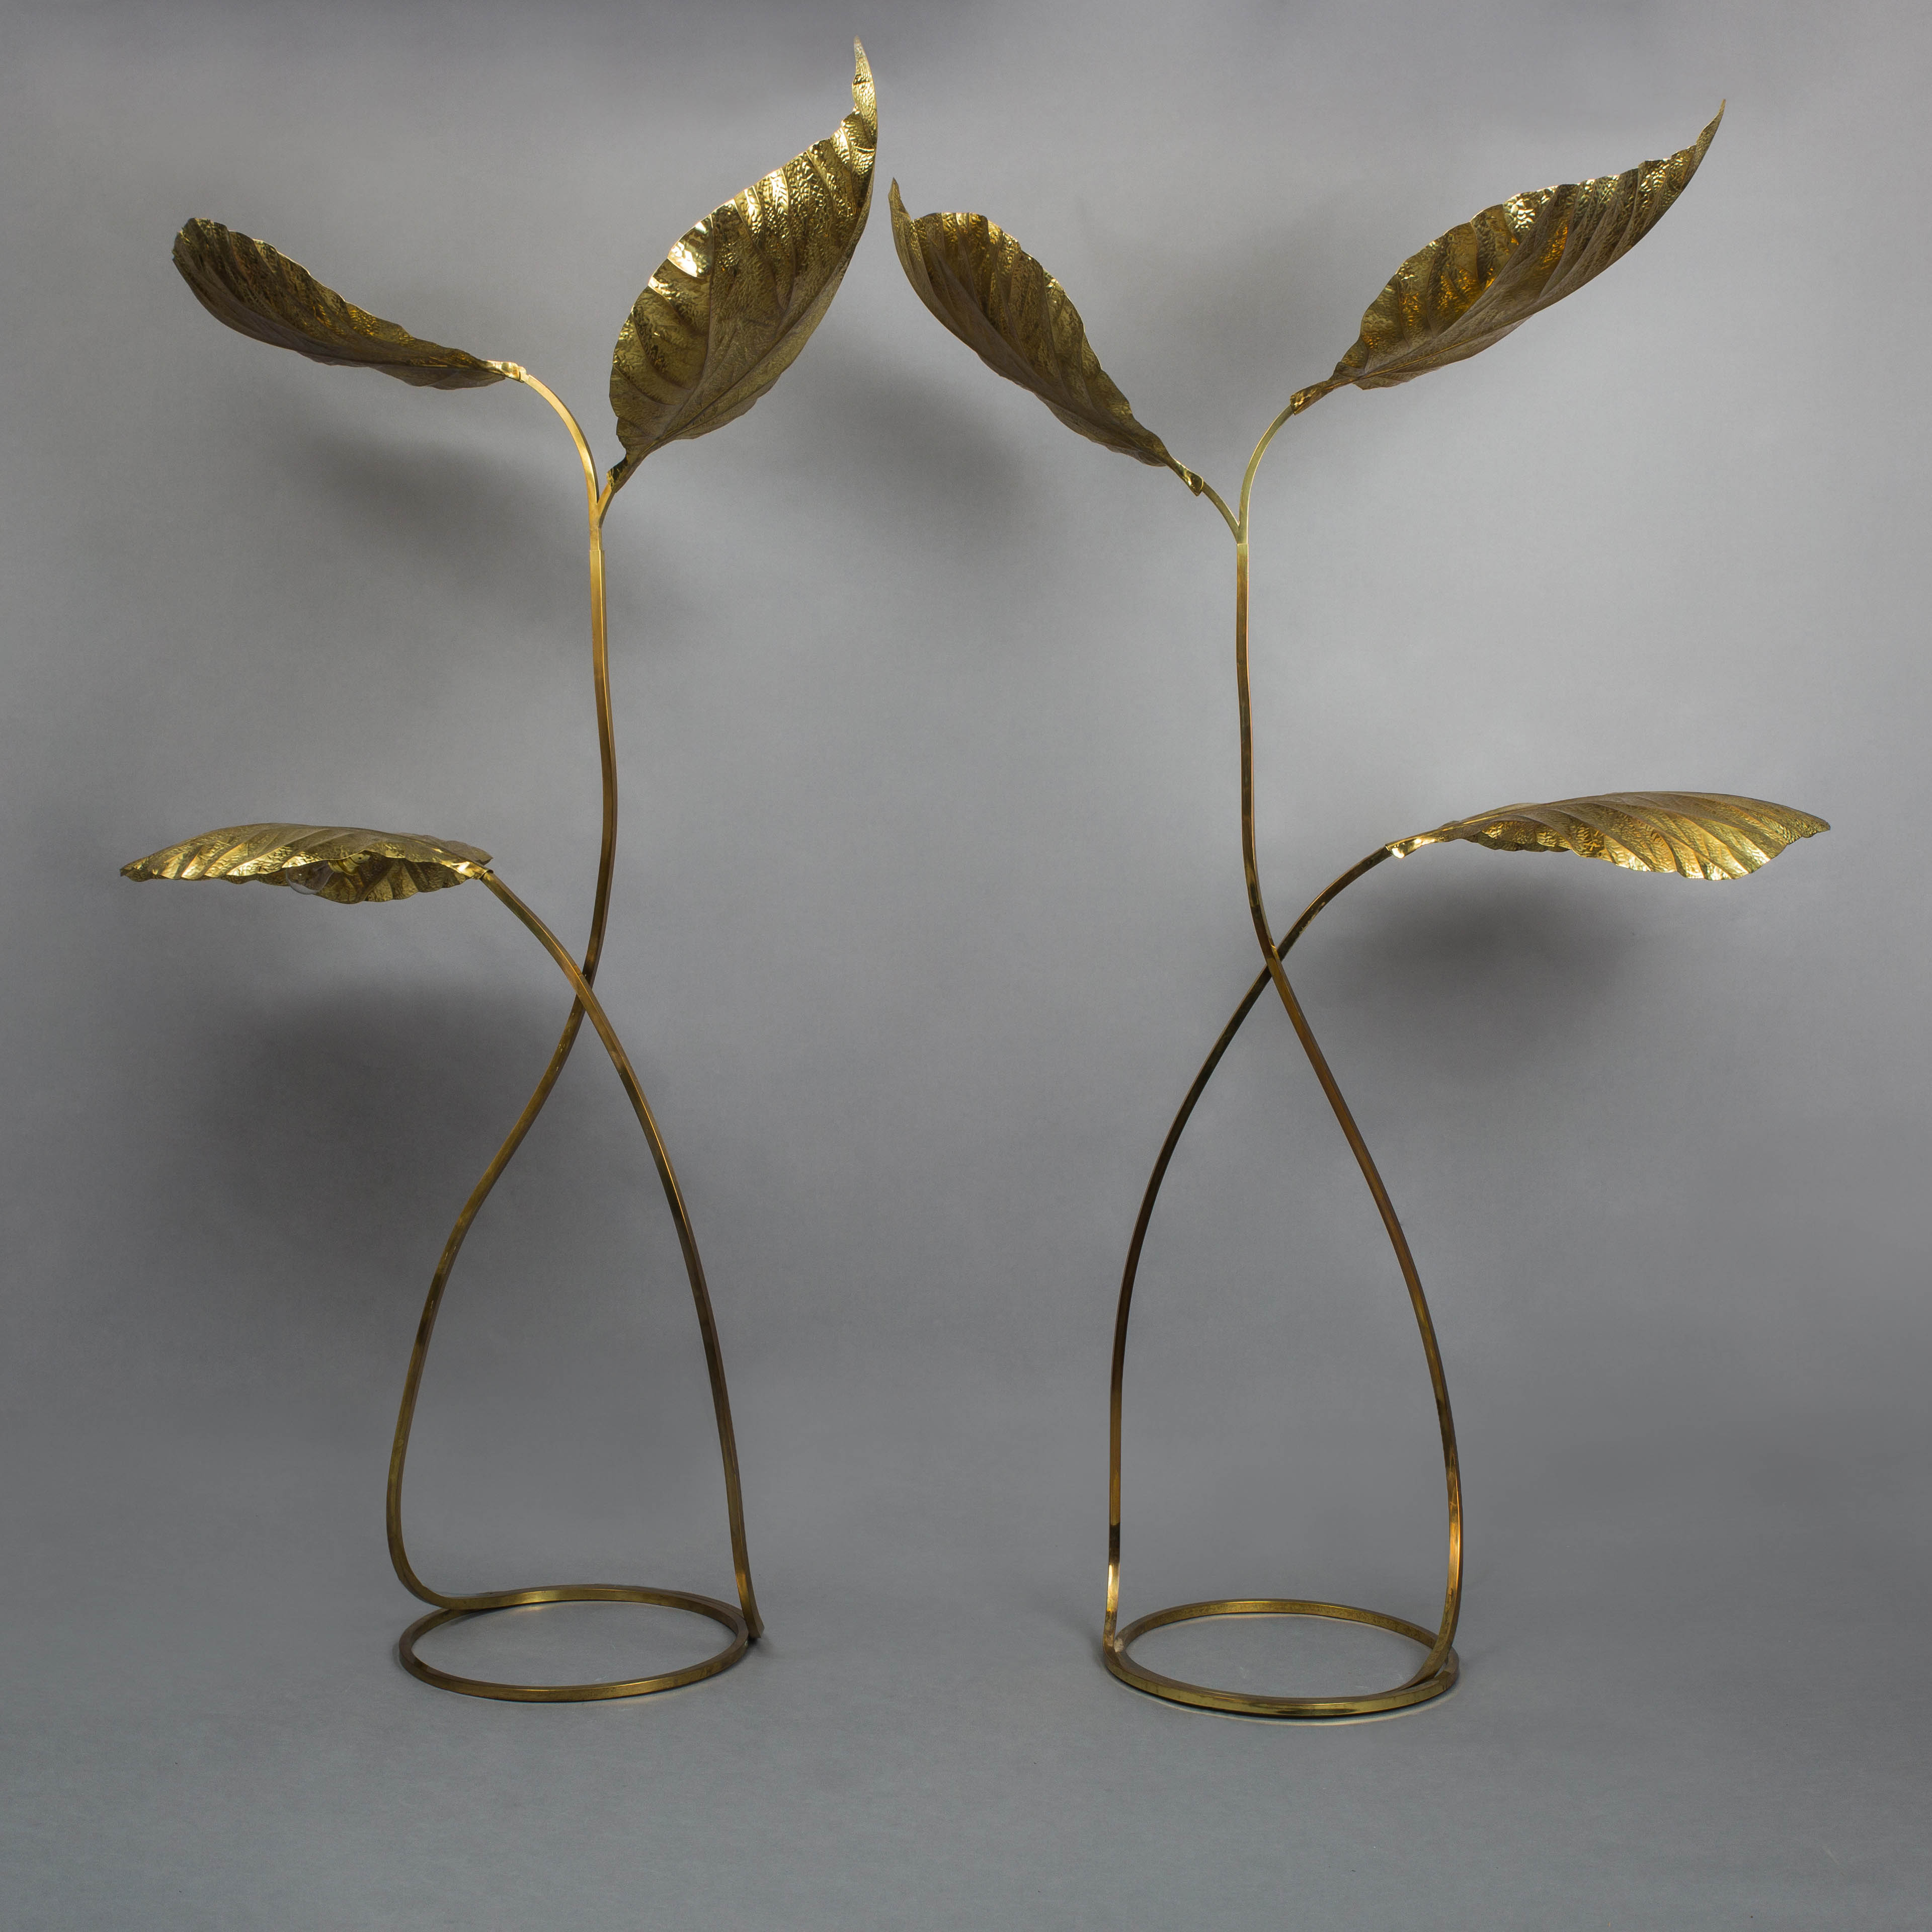 Pair of Floor Lamps by Carlo Giorgi for Bottega Gadda | soyun k.